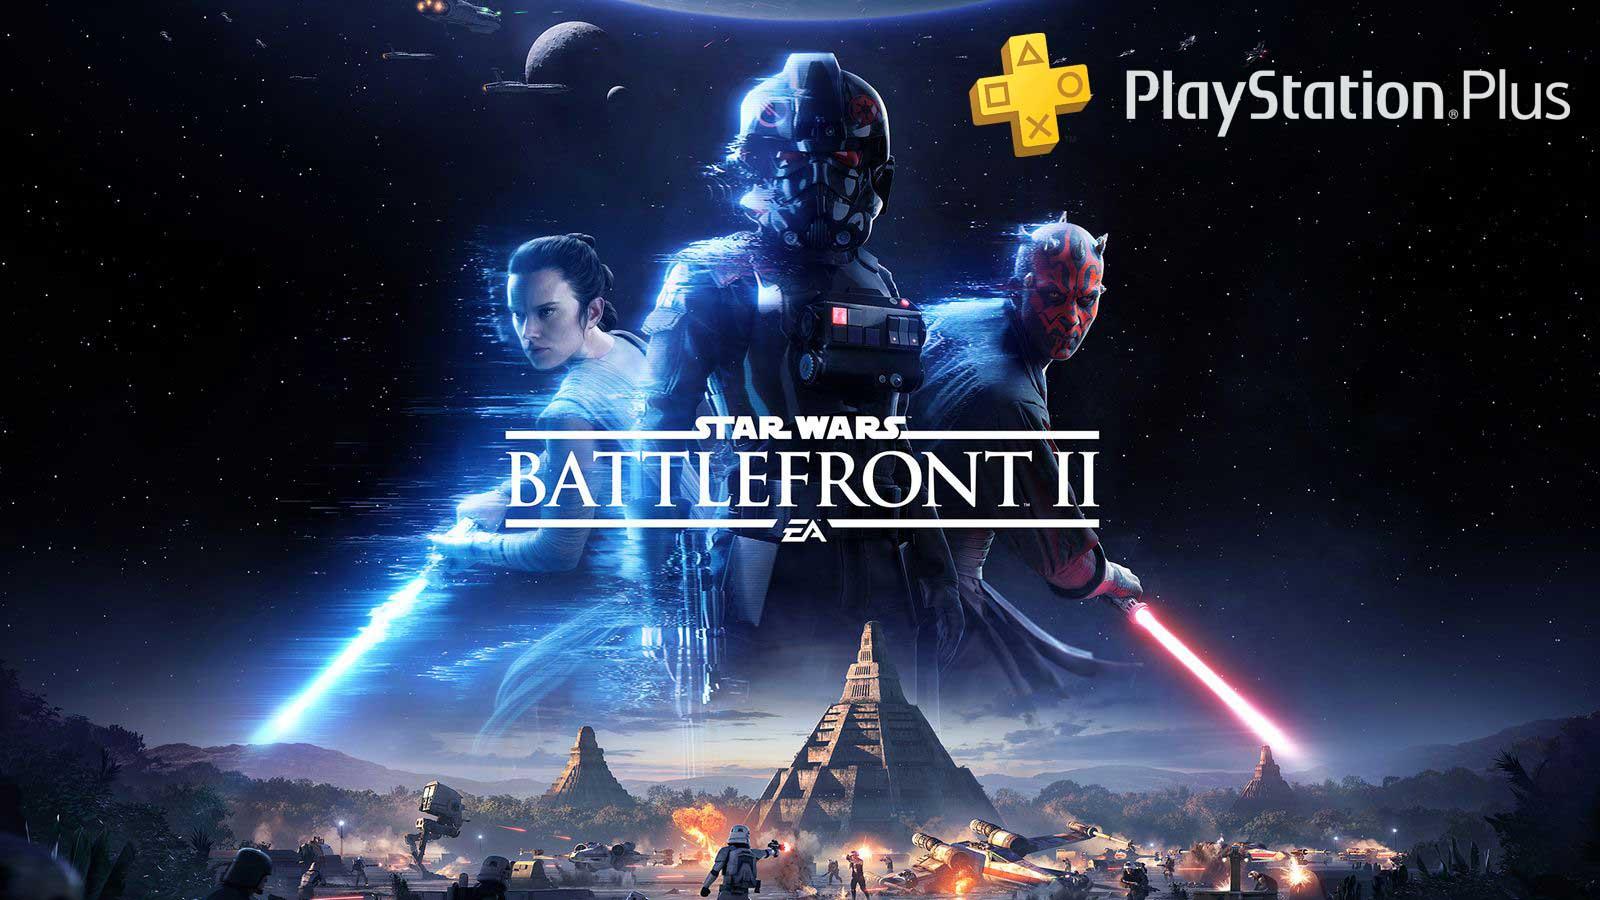 PlayStation Plus June 2020 Star Wars Battlefront II